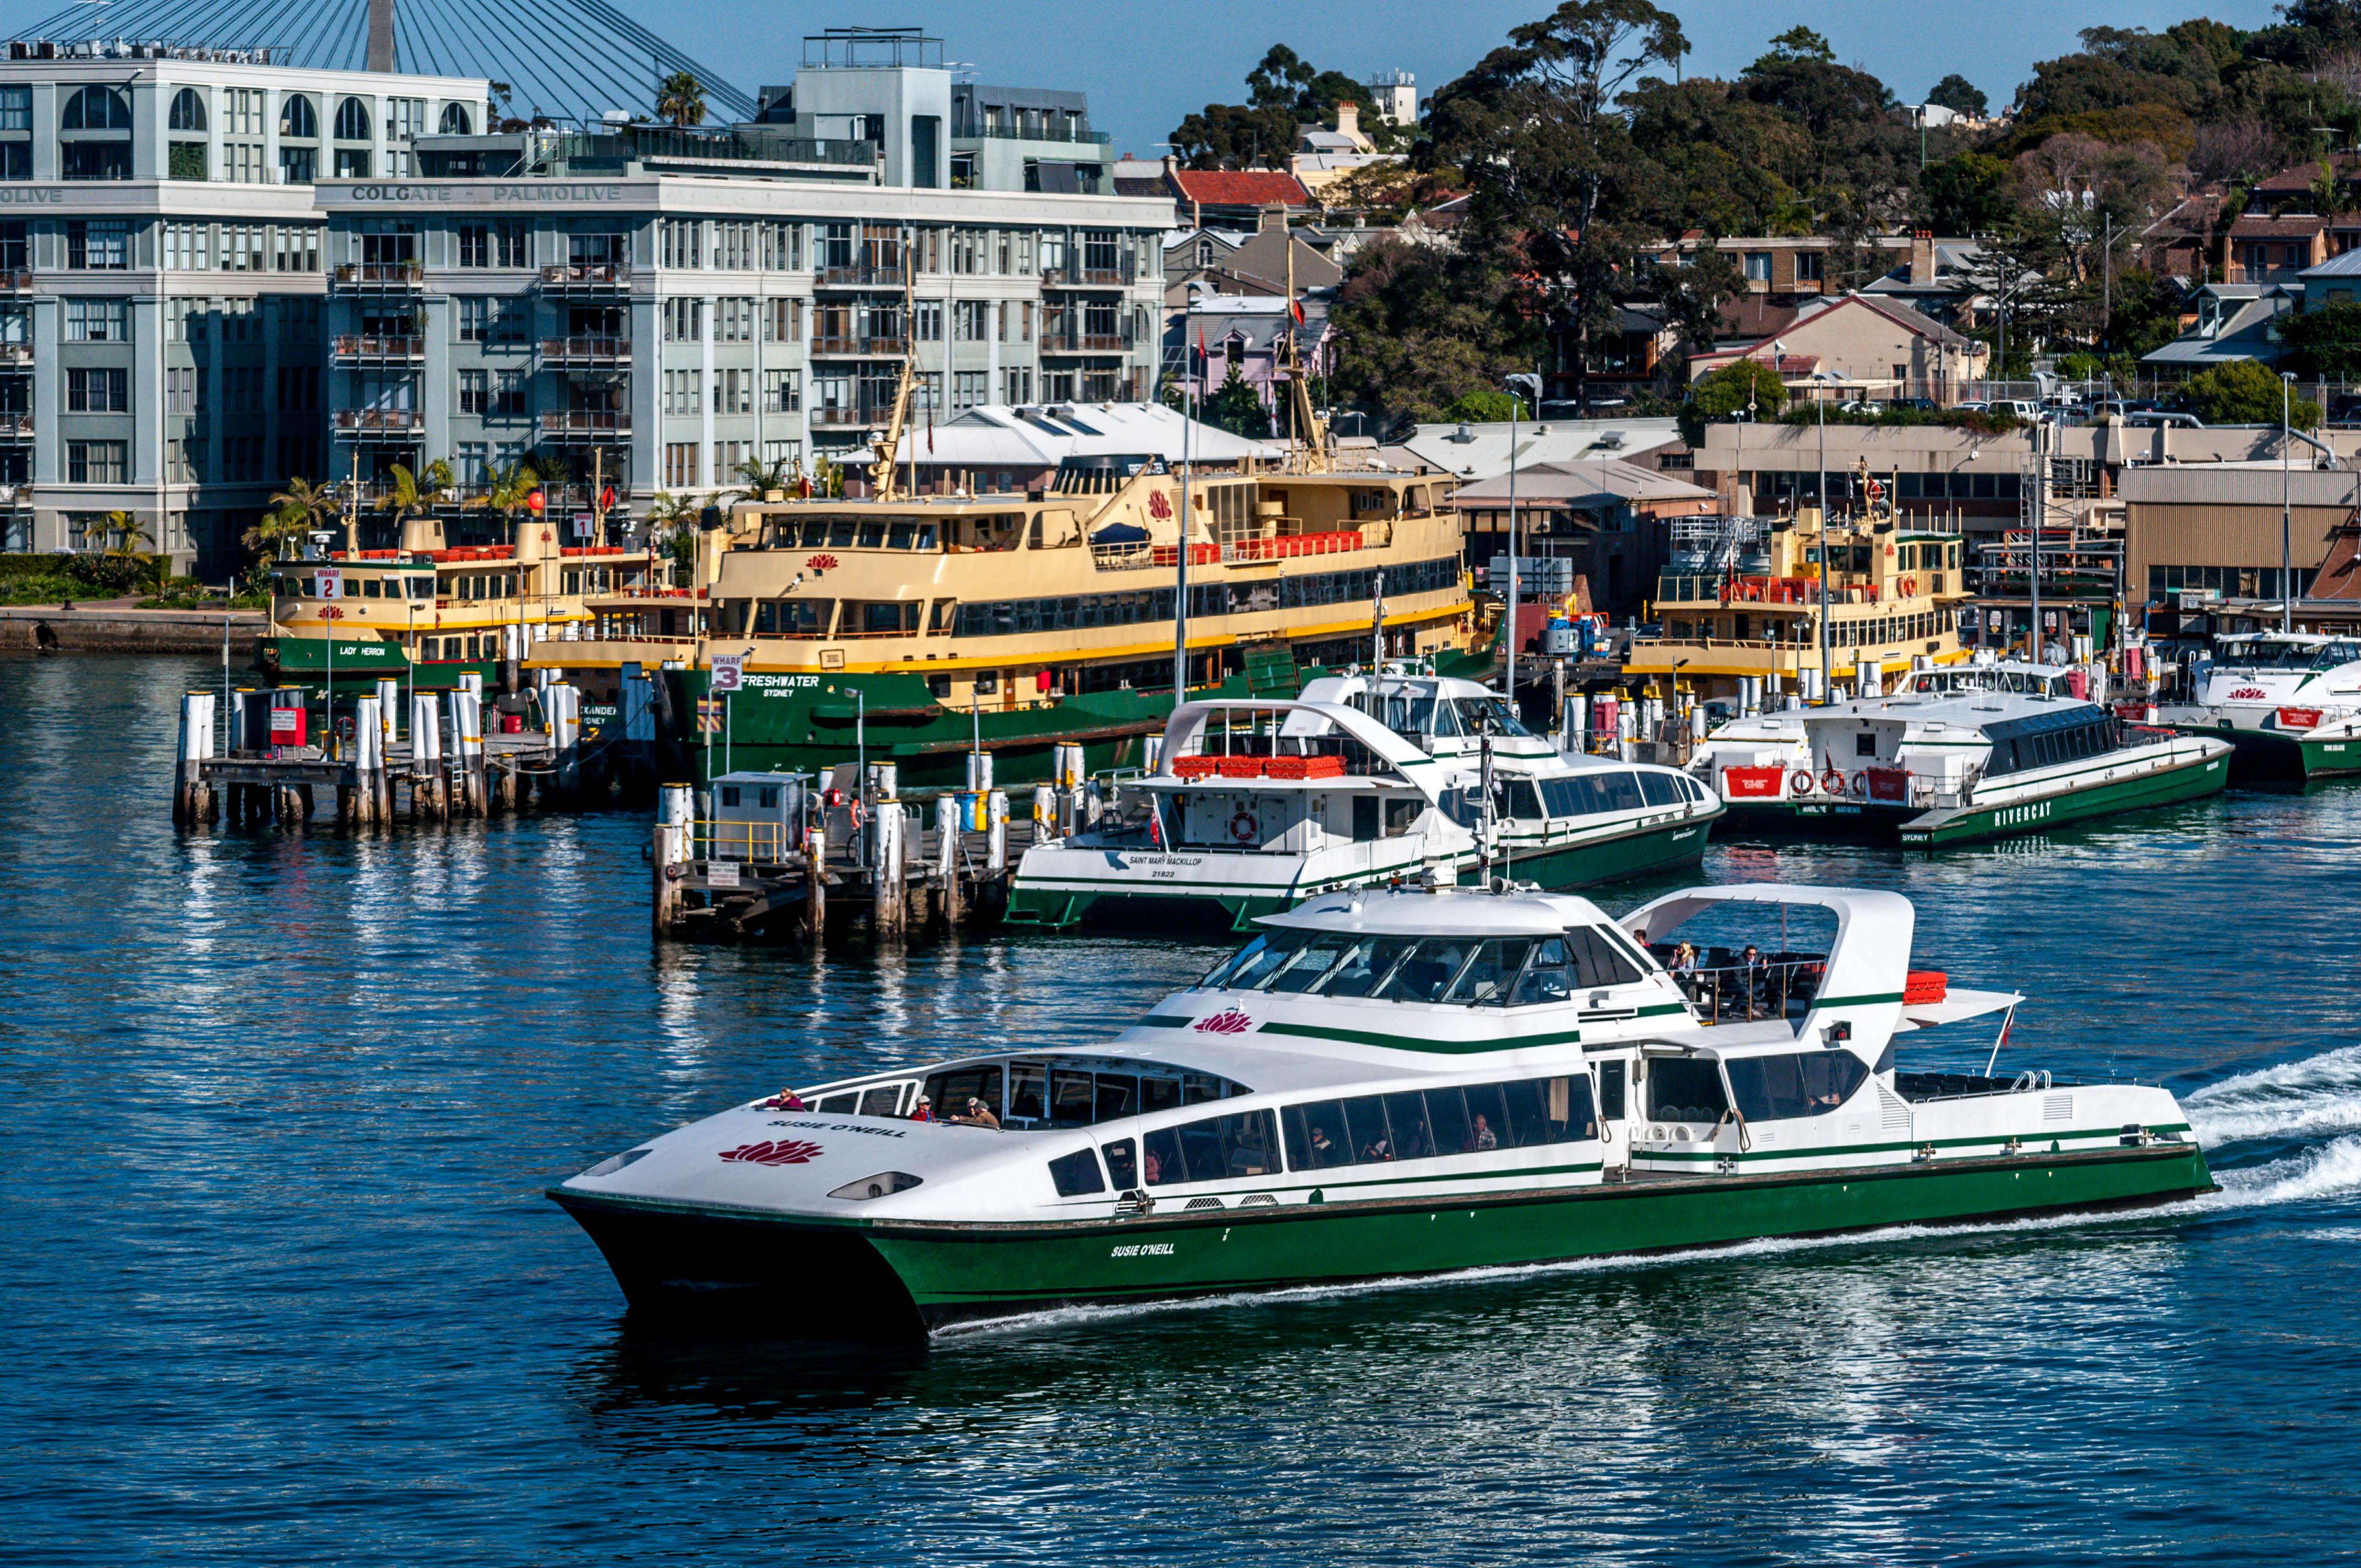 List of Sydney Ferries vessels - Wikipedia